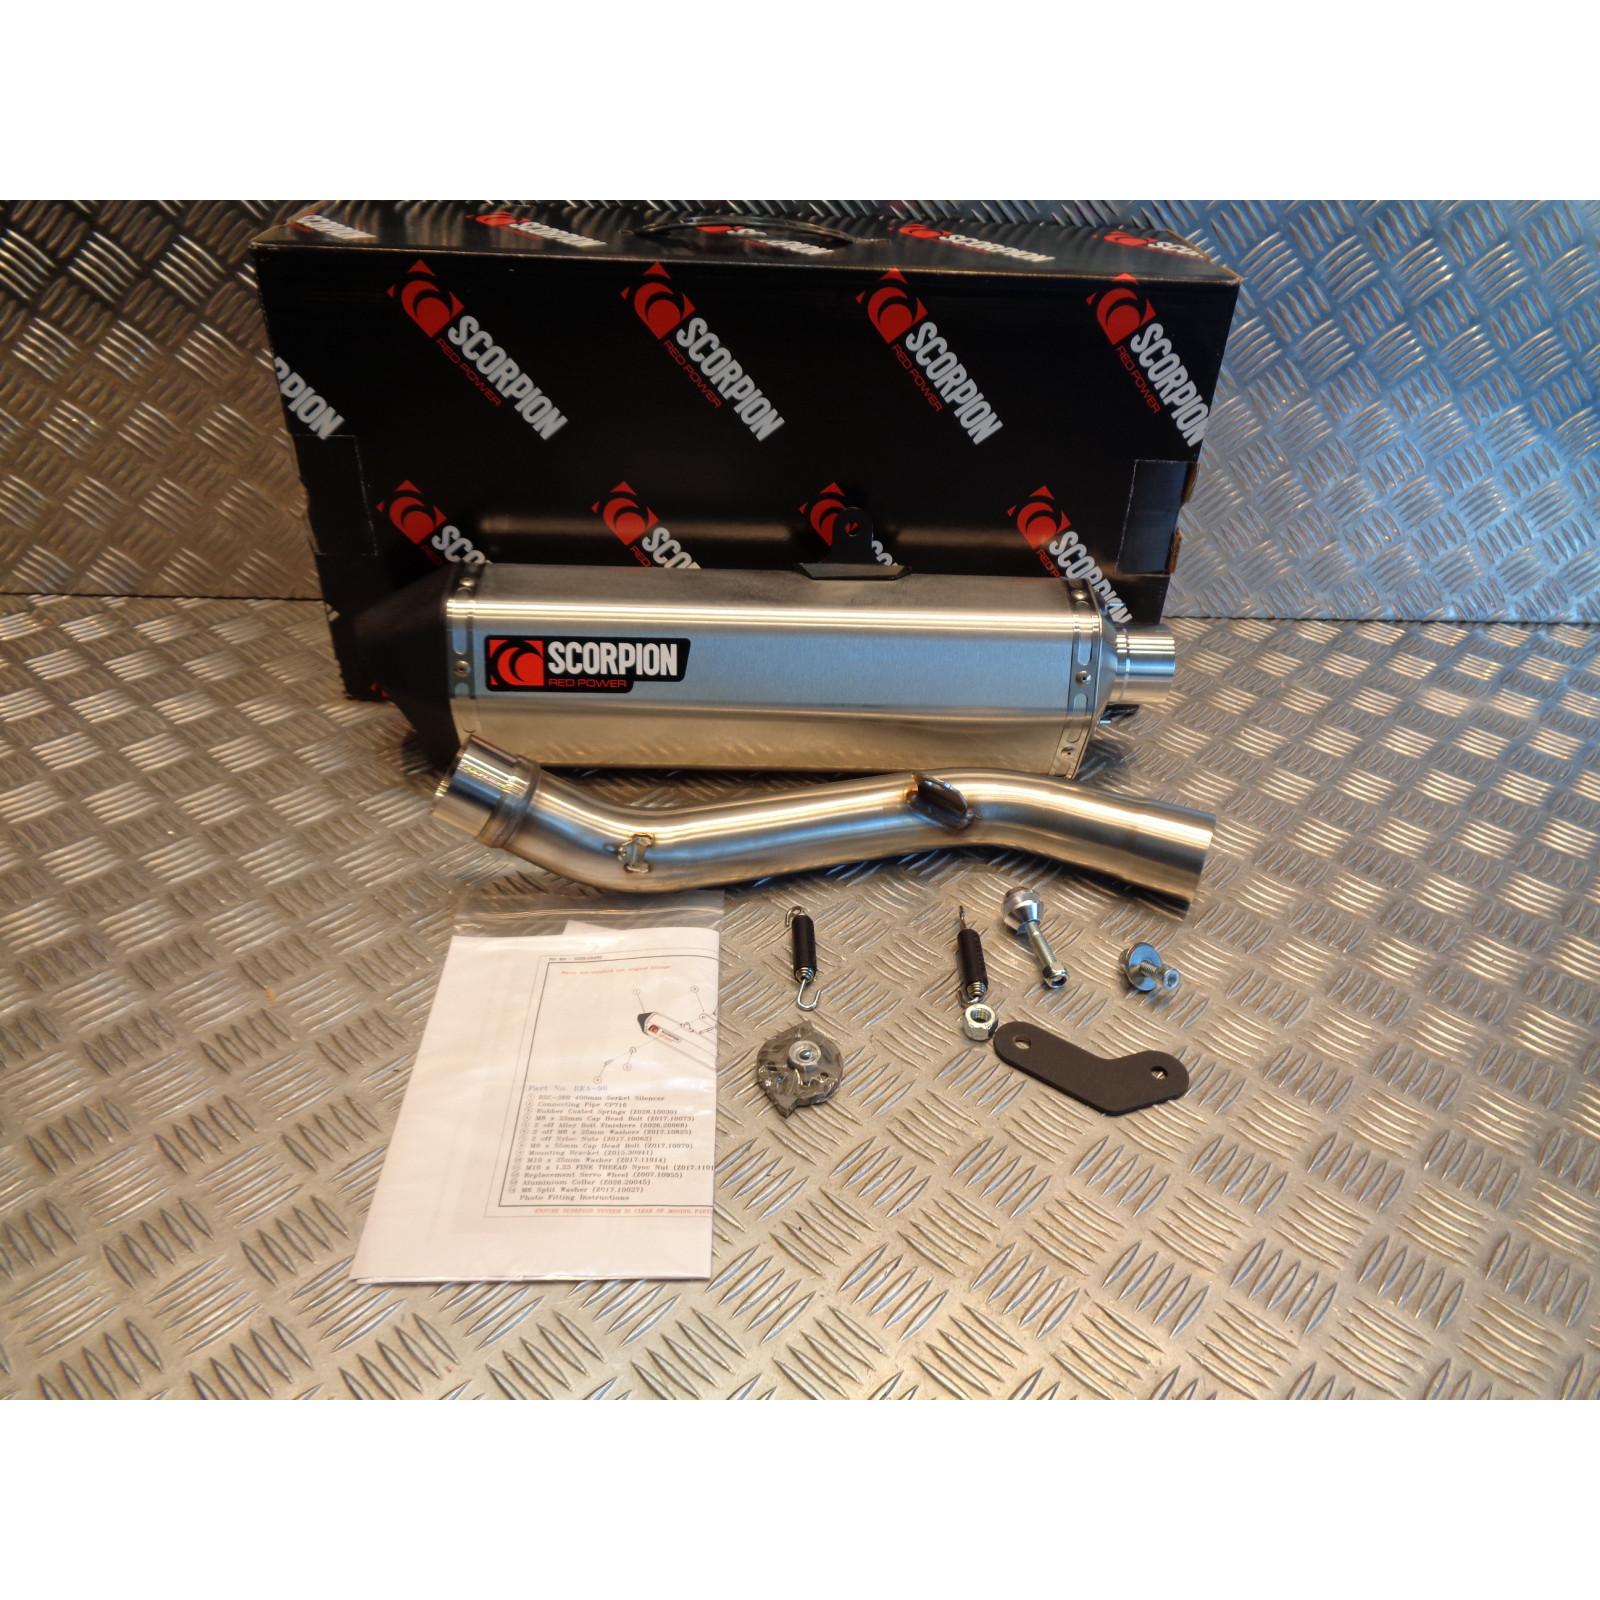 pot echappement silencieux scorpion serket inox brosse moto kawasaki z 800 RKA98SEO bihr 76209839